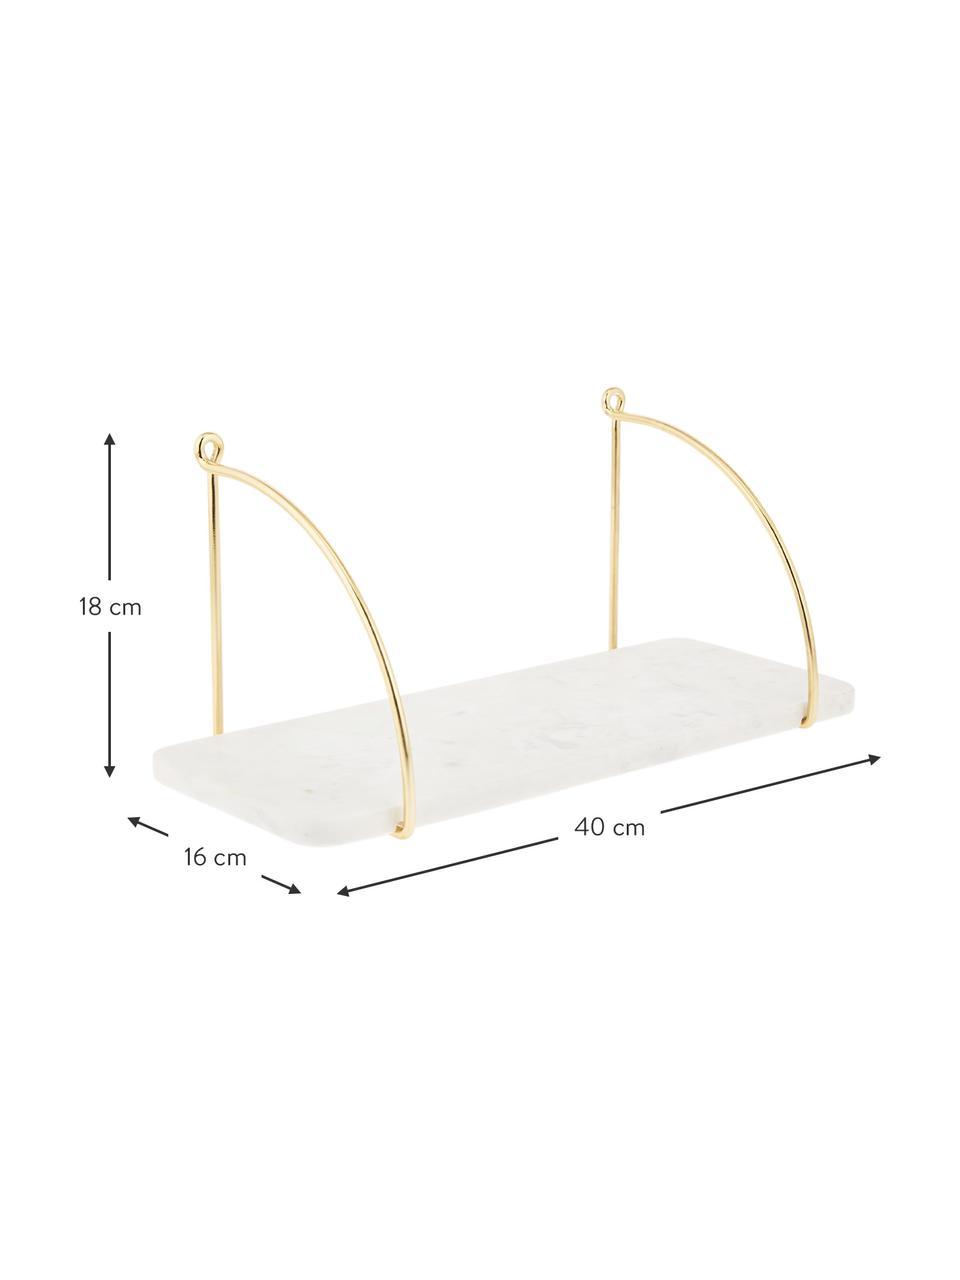 Marmeren wandplank Porter, Plank: marmer, Wandbevestiging: goudkleurig. Plank: gemarmerd wit, 60 x 24 cm